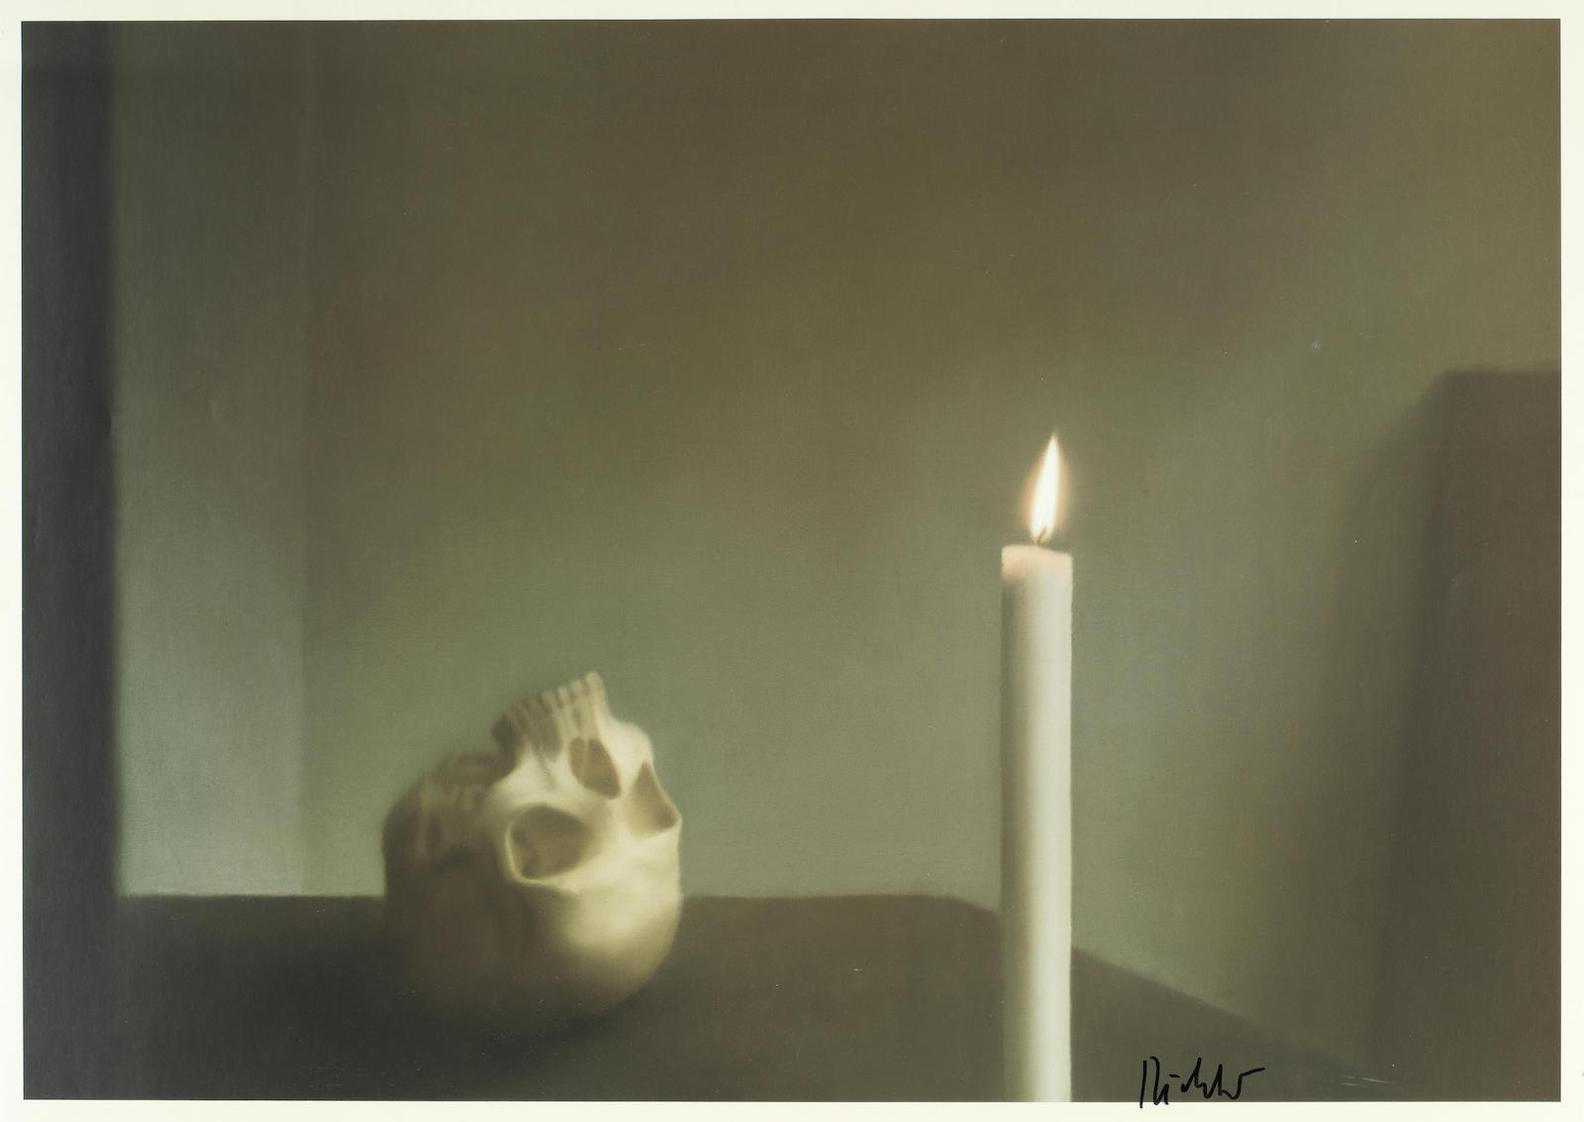 Schädel mit Kerze (Crâne avec bougie), Gerhard Richter, 1983